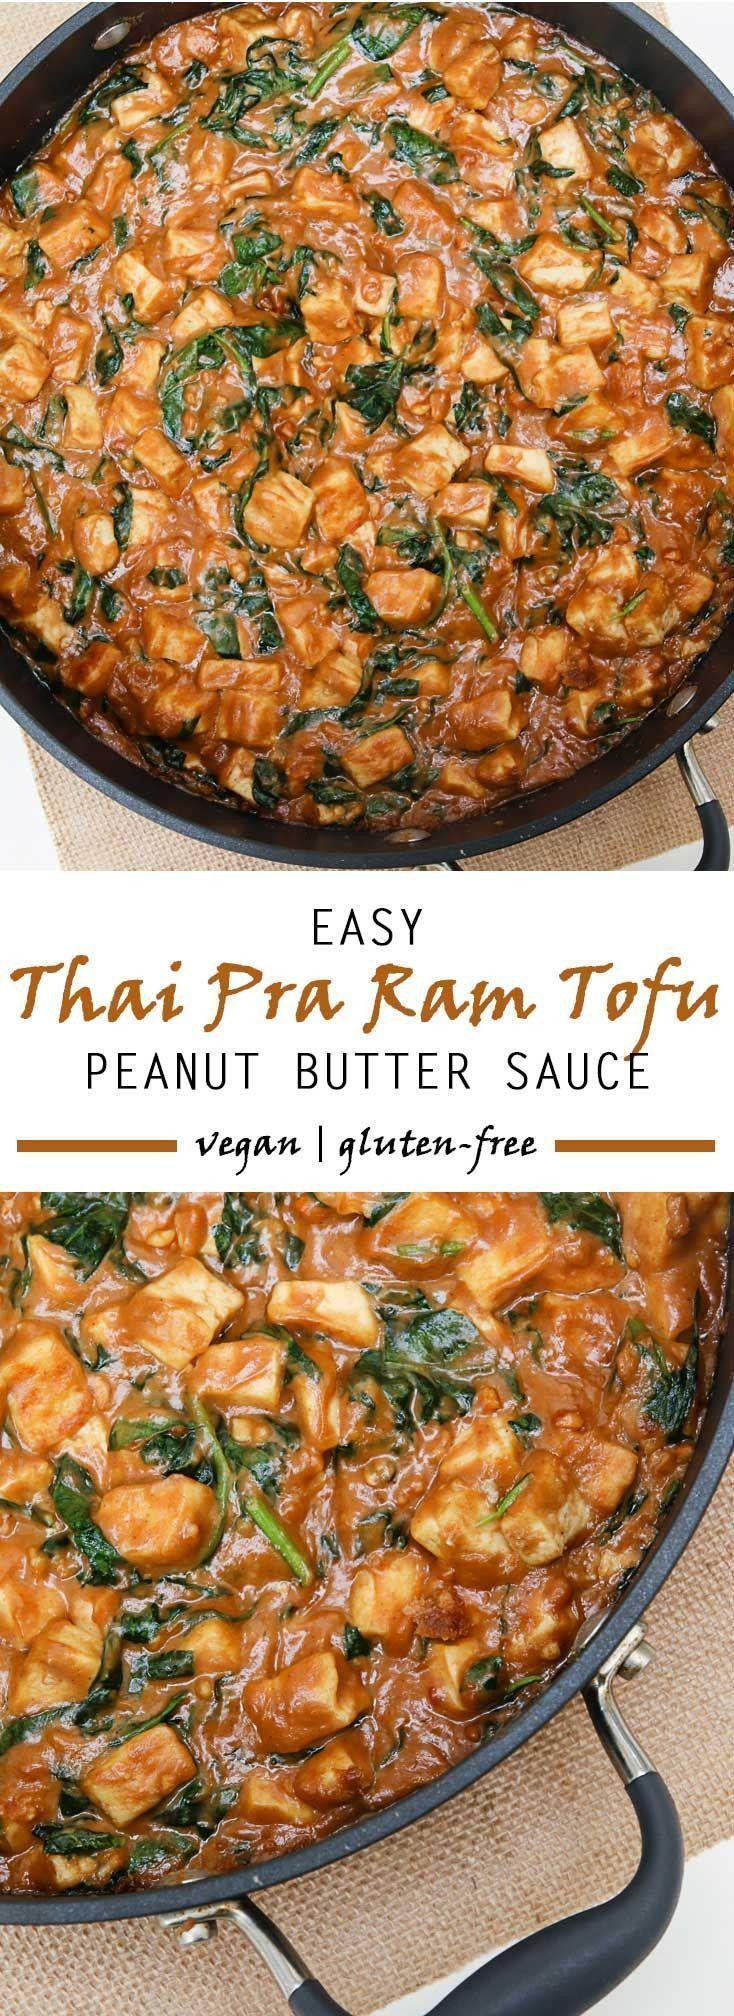 Thai Pra Ram Tofu (Peanut Butter Sauce)